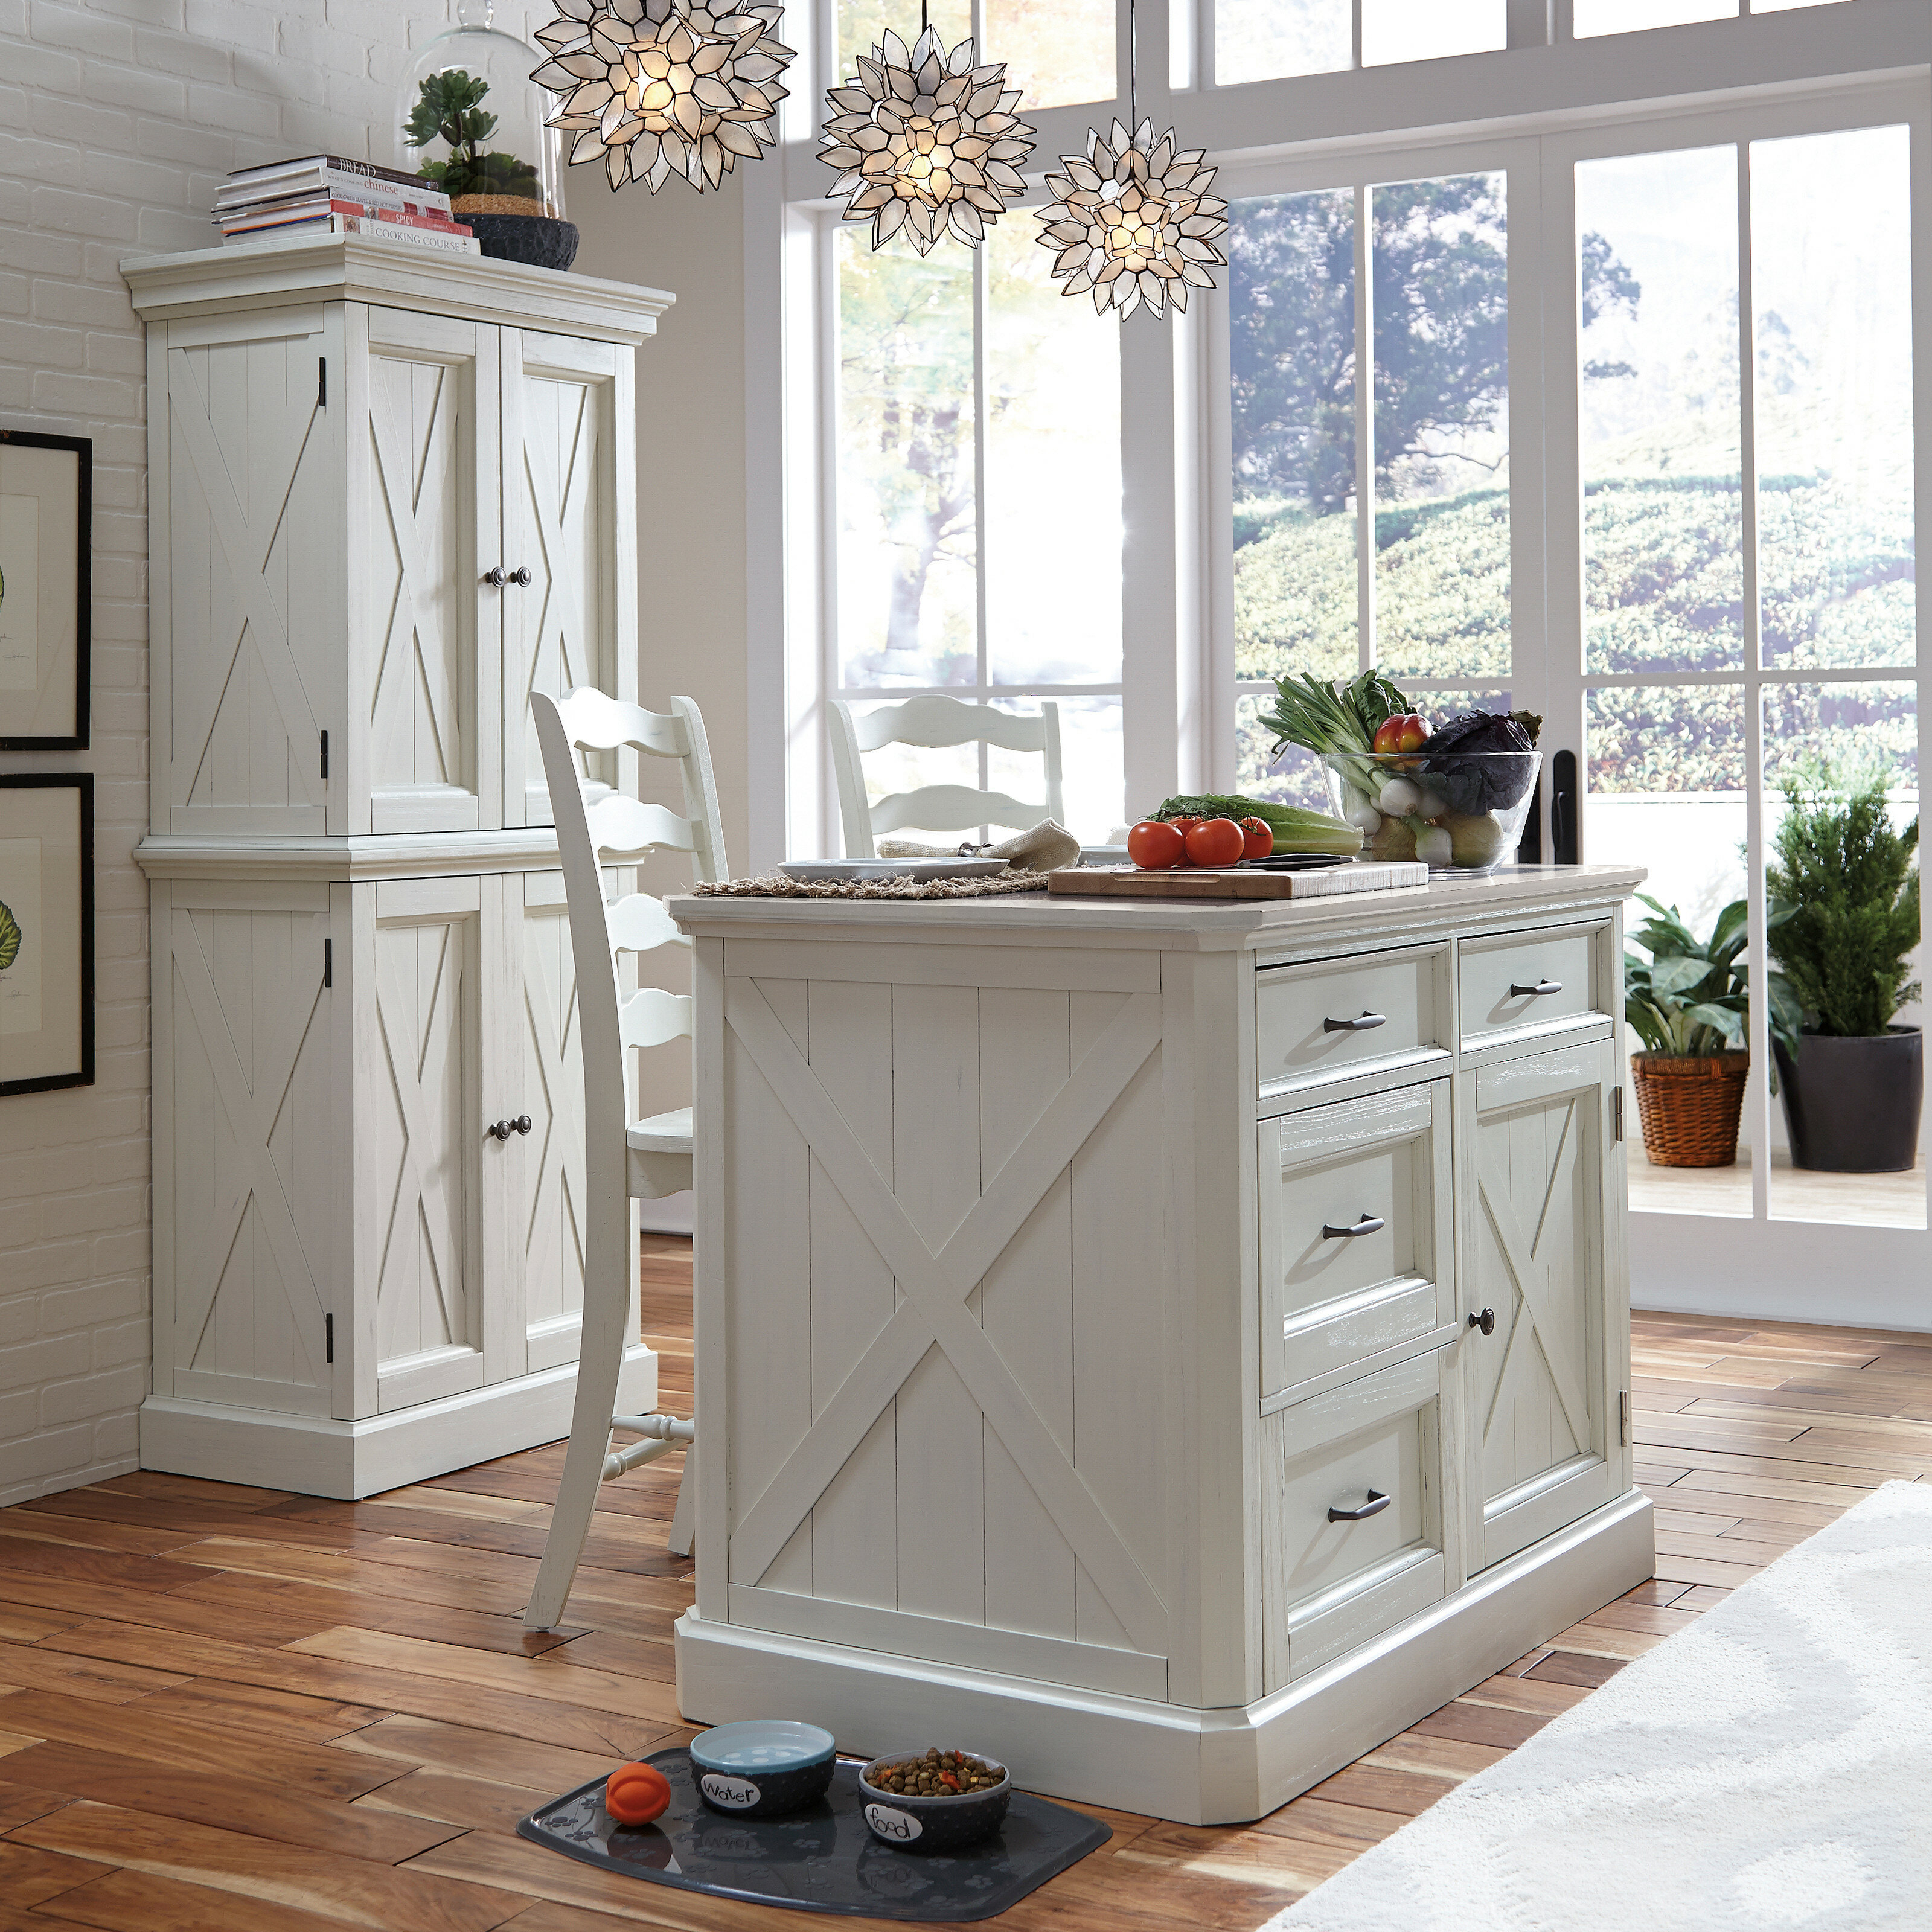 Laurel Foundry Modern Farmhouse Moravia Kitchen Island Set With Granite Top Reviews Wayfair